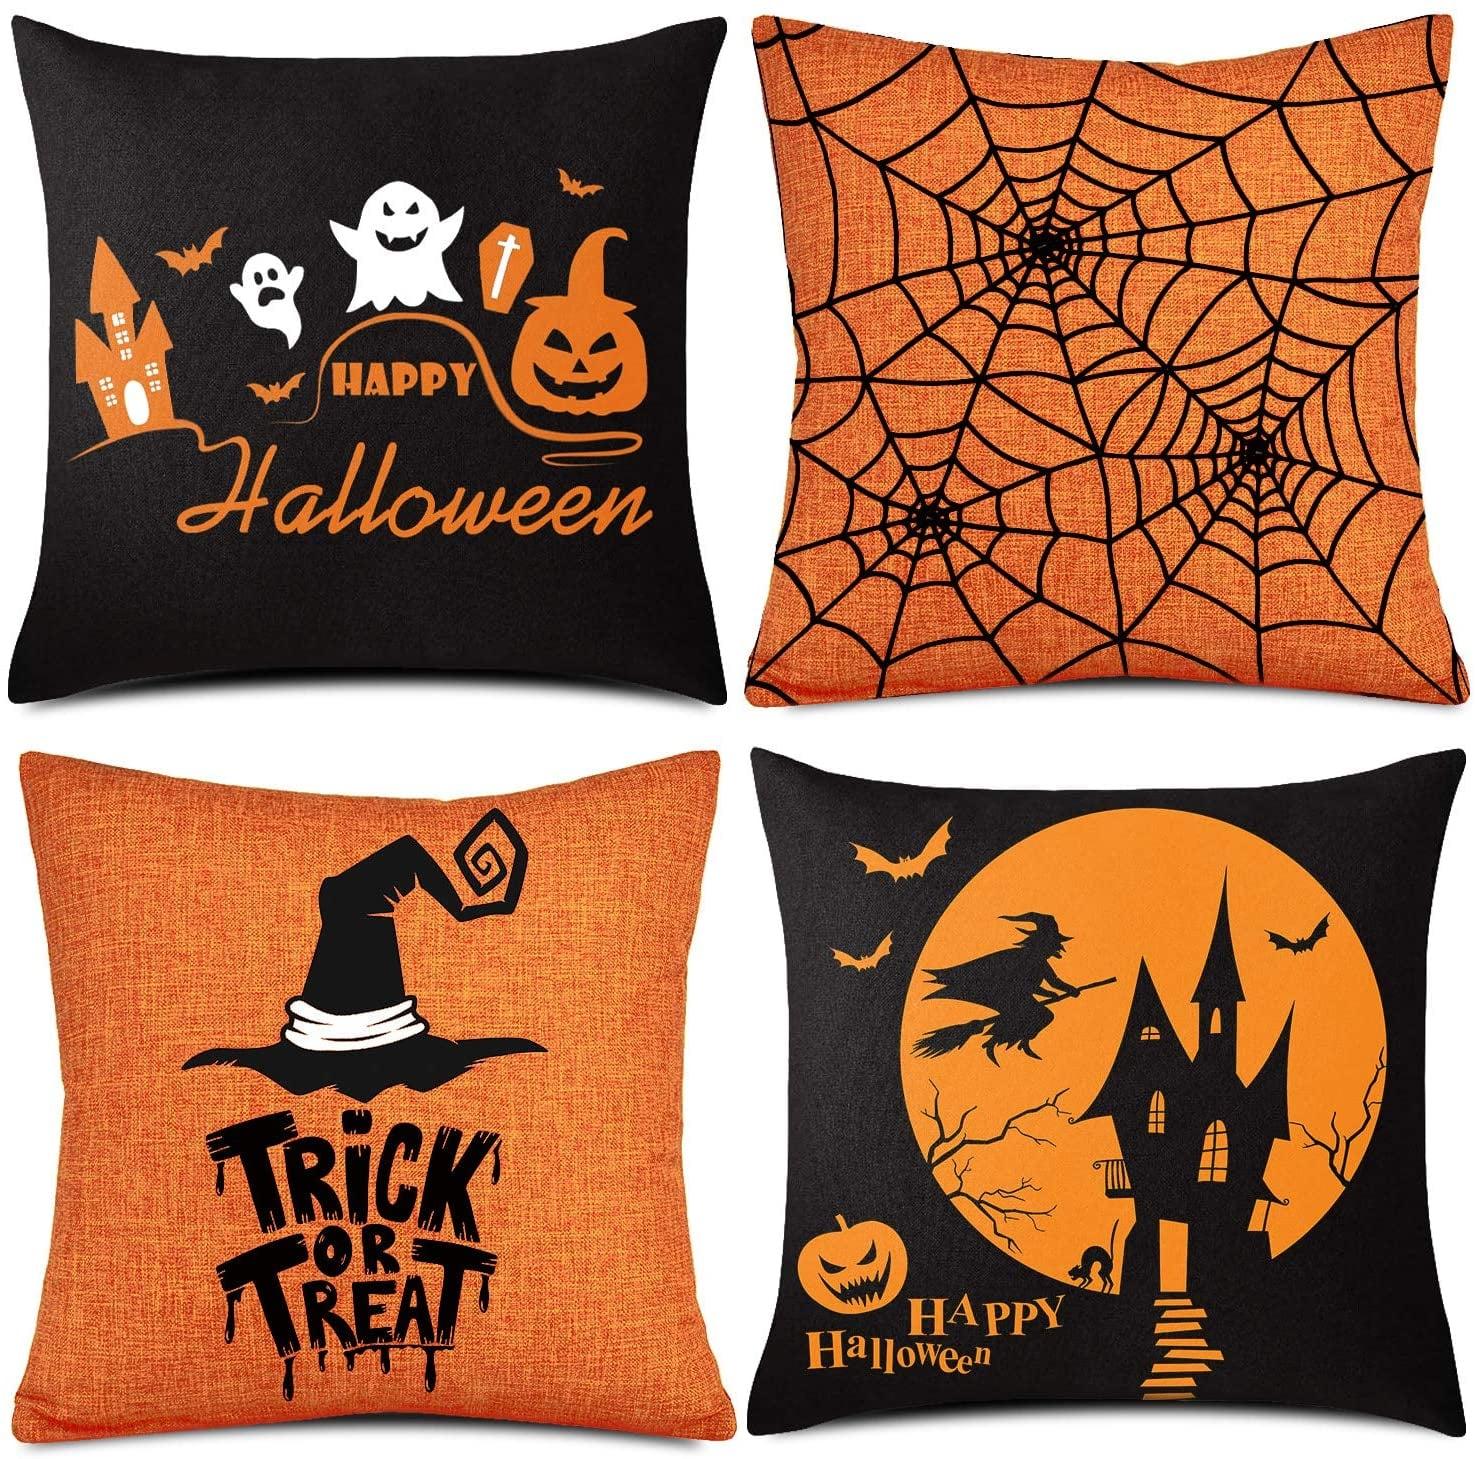 Best Halloween Decorations On Amazon Popsugar Smart Living